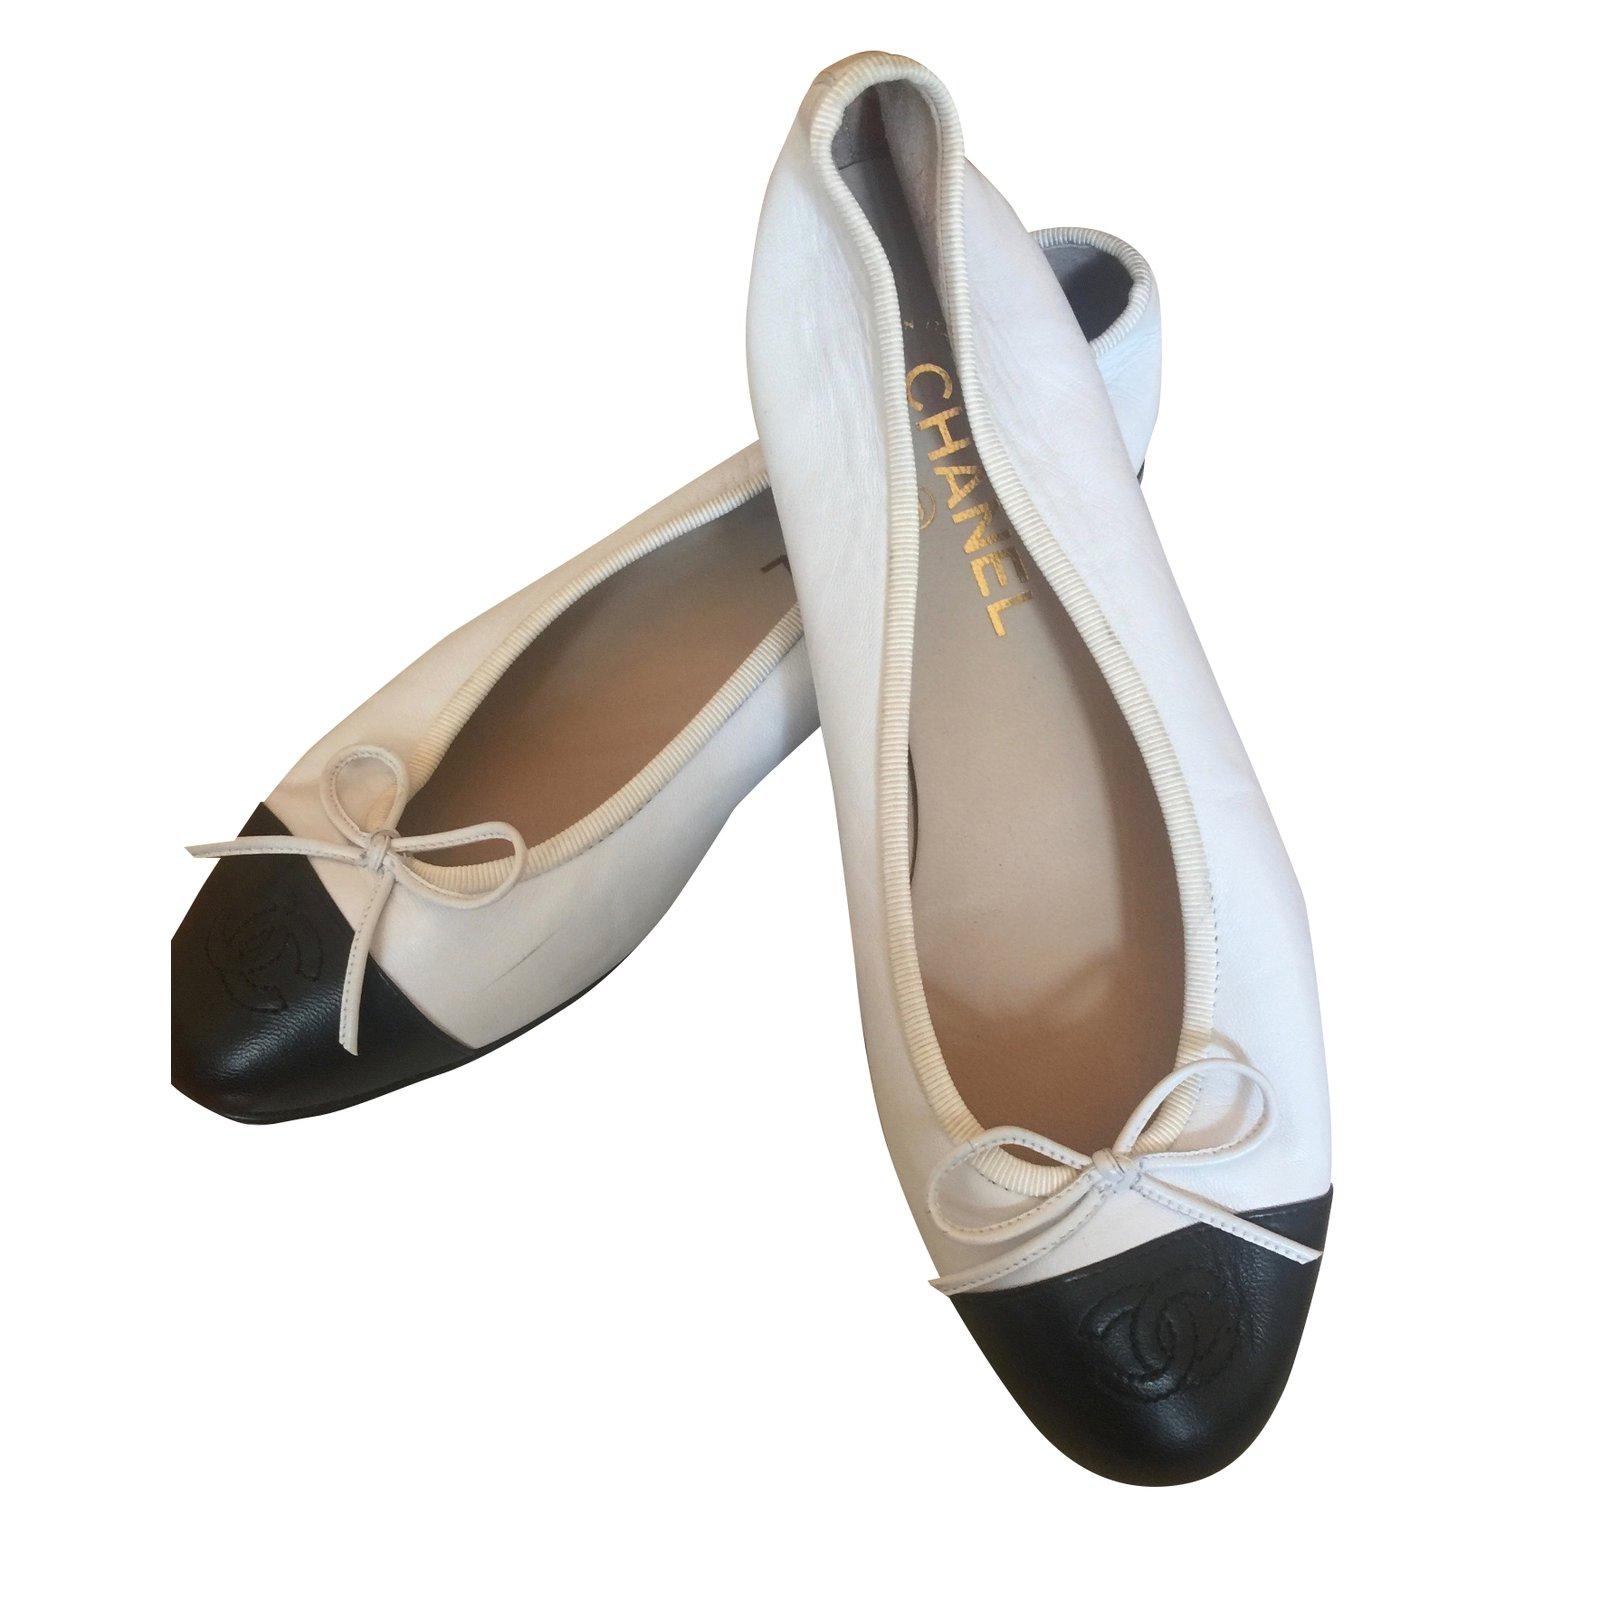 Chanel Ballerinas Ballet flats Leather